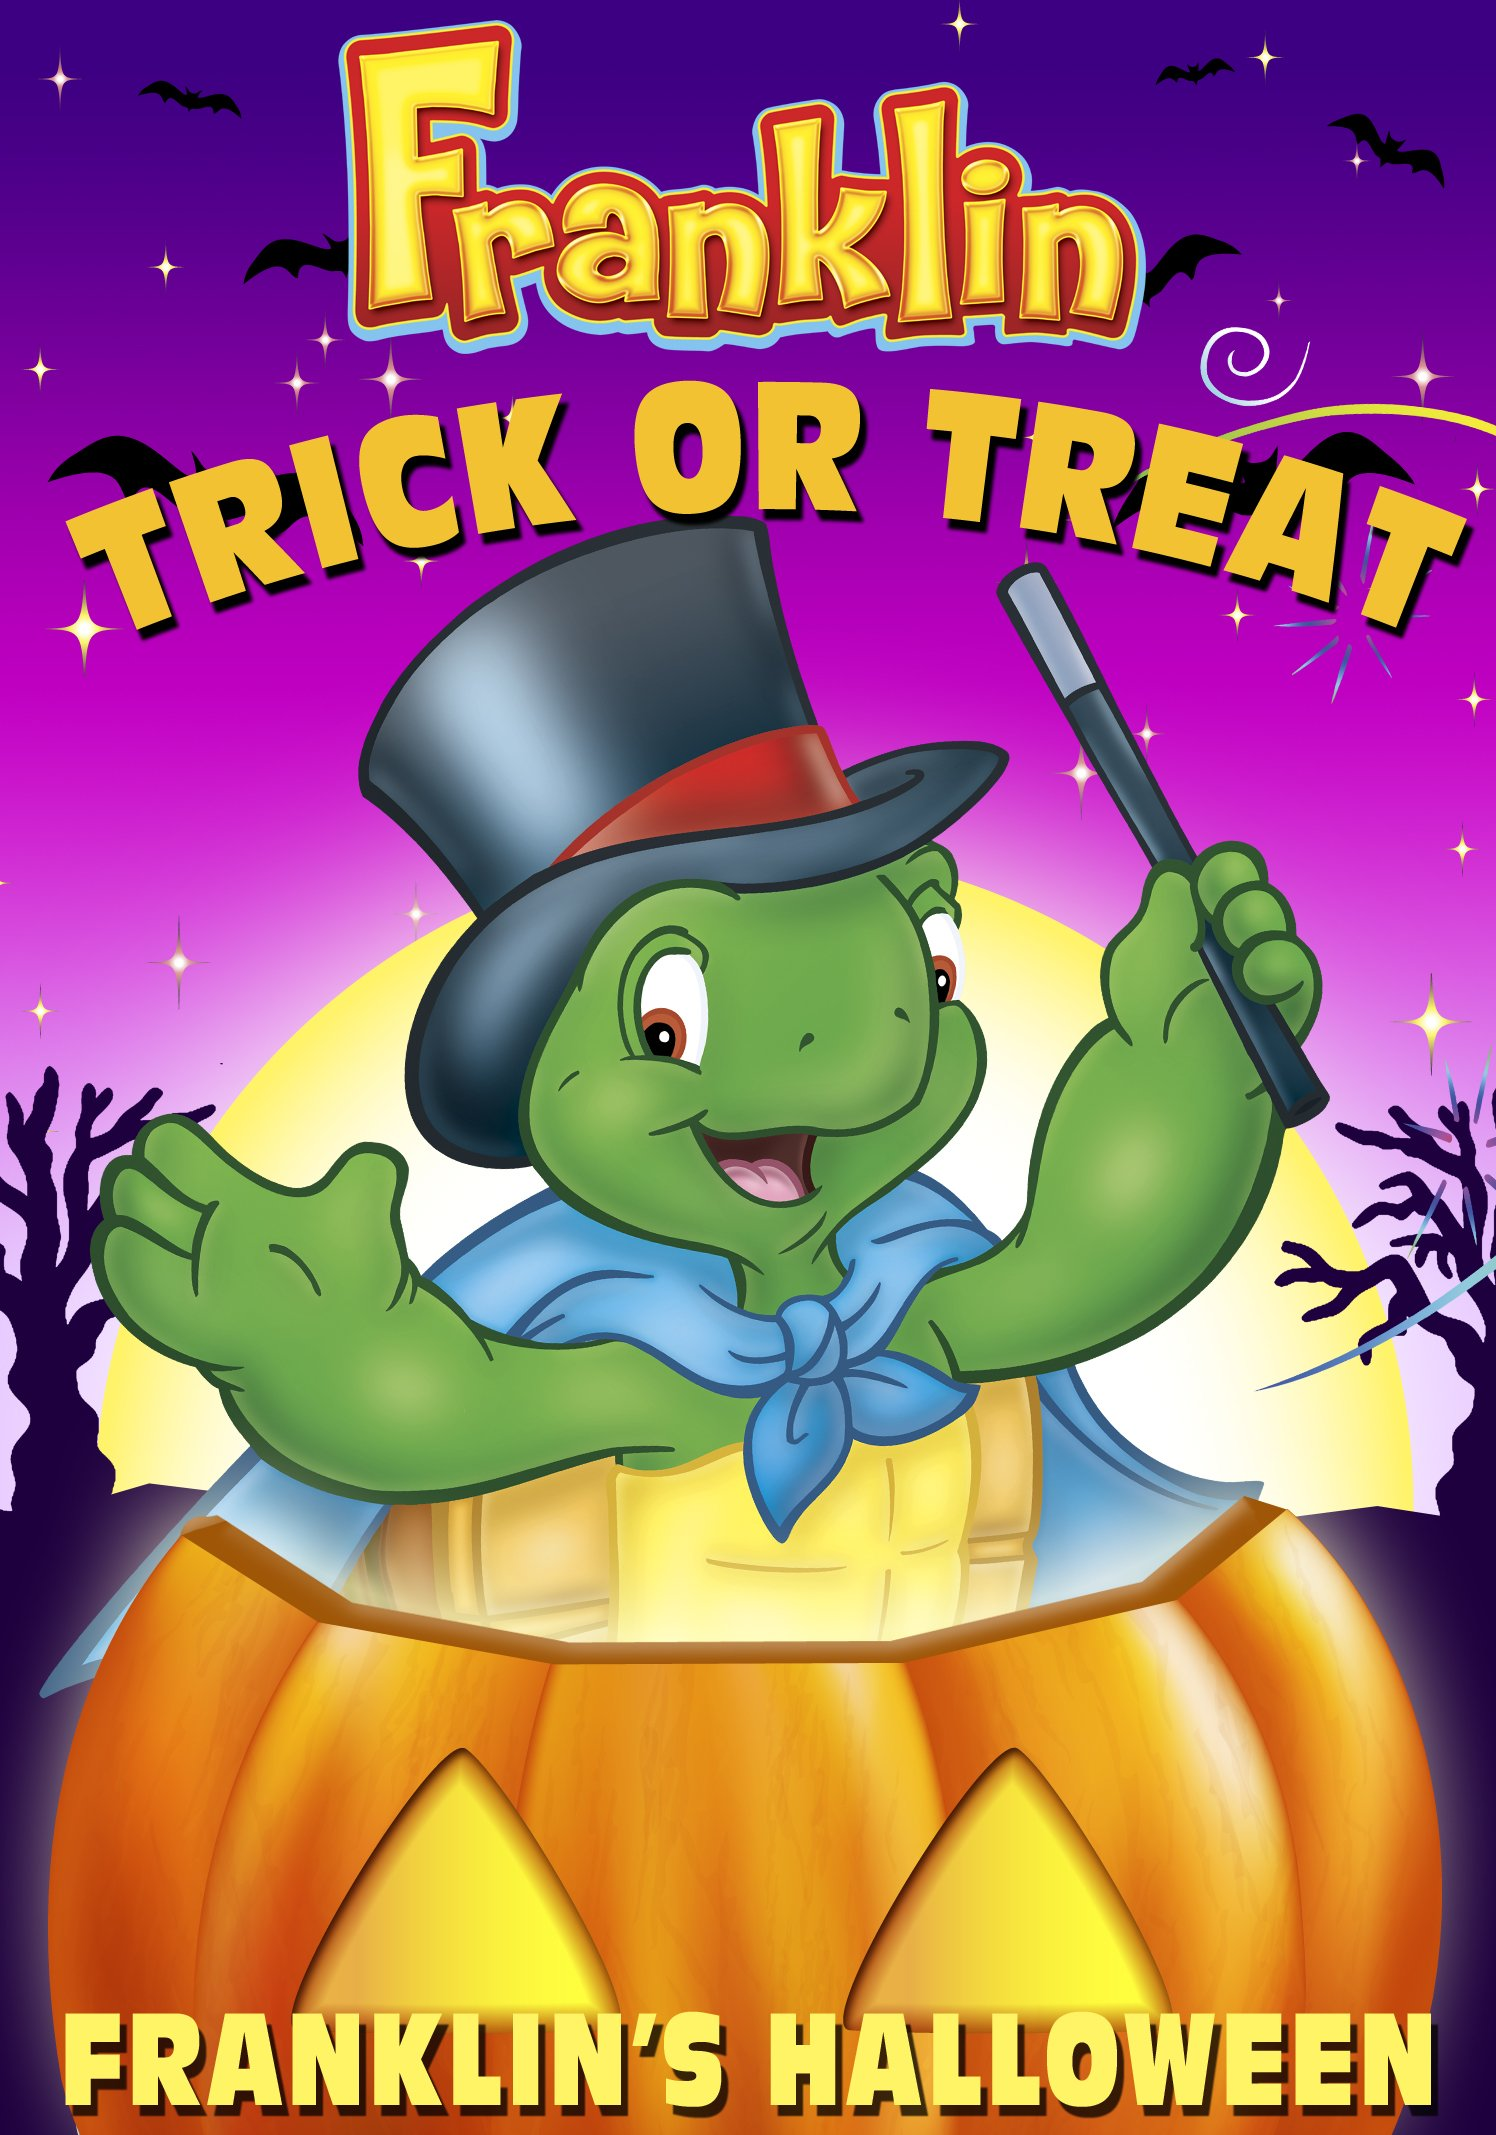 DVD : Franklin-Trick or Treat-Franklin's Halloween (Full Frame)